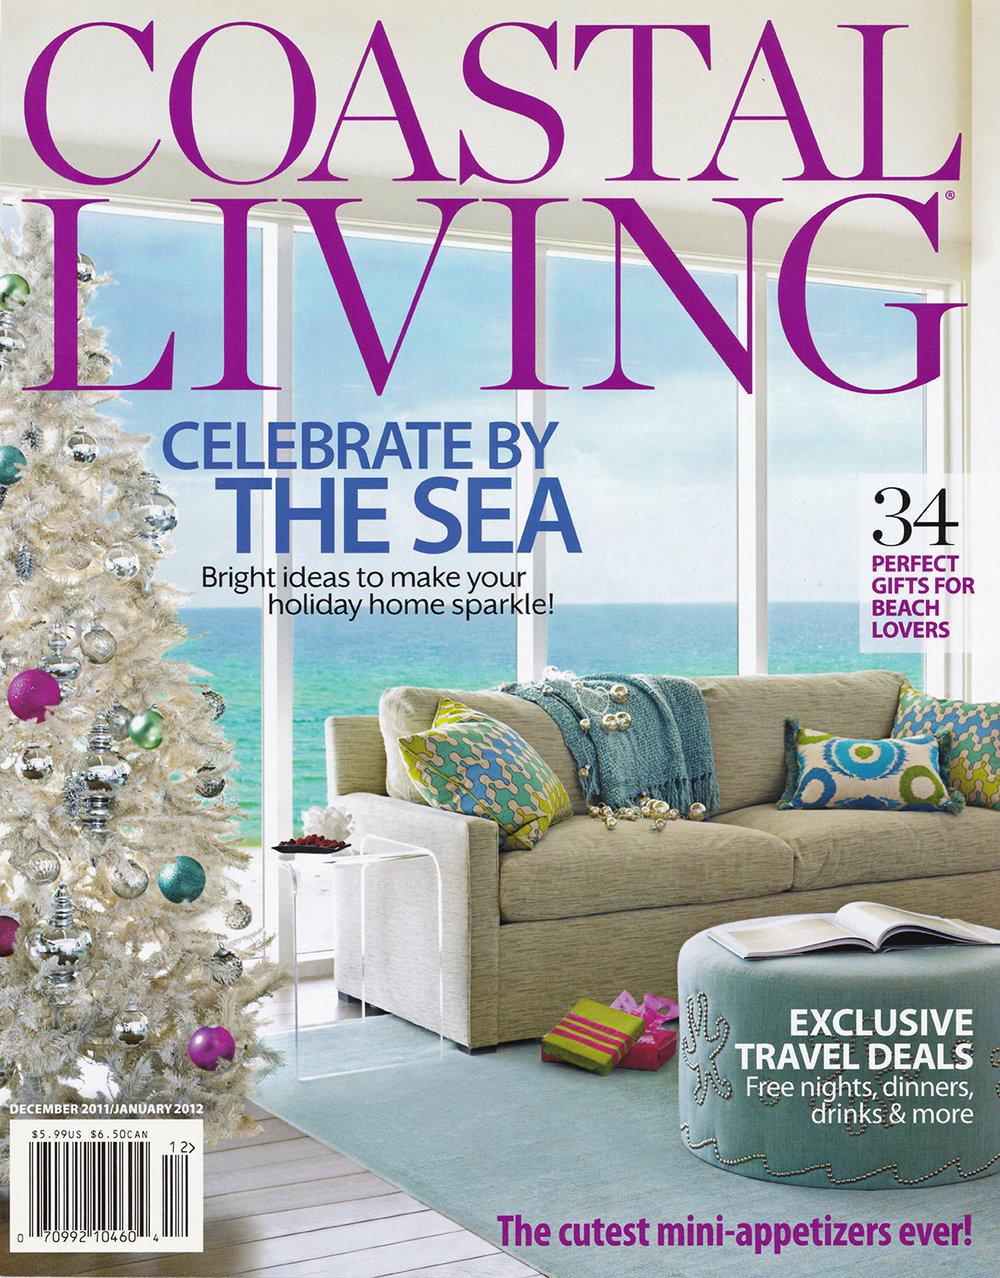 Coastal Living January 2o12 READ MORE